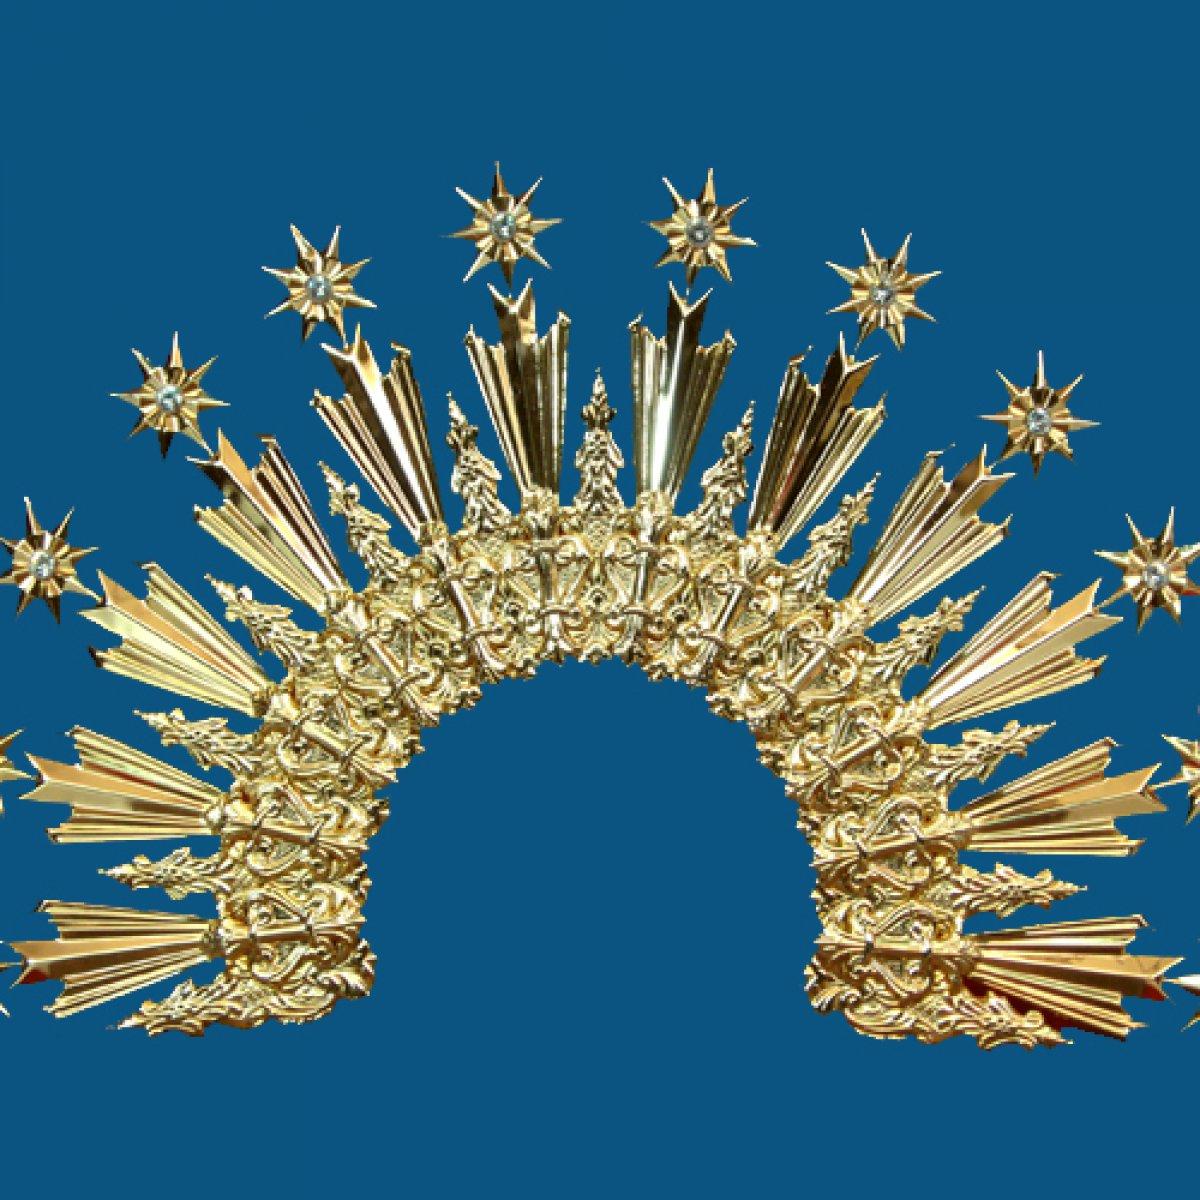 Corona 10 Diadema